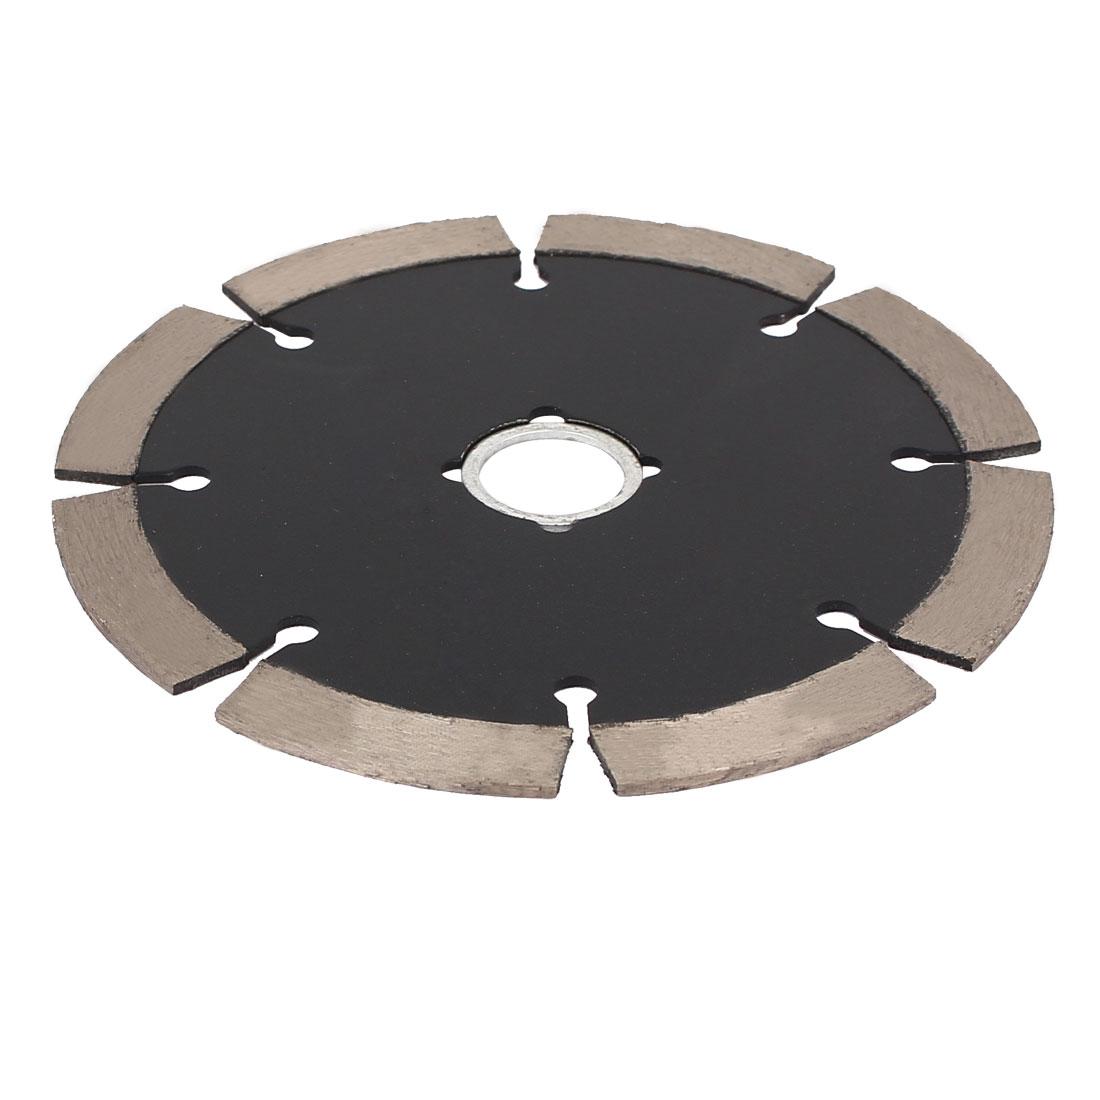 108mm Diameter 15300RPM Dry or Wet Cutting Segmented Diamond Saw Blade Black